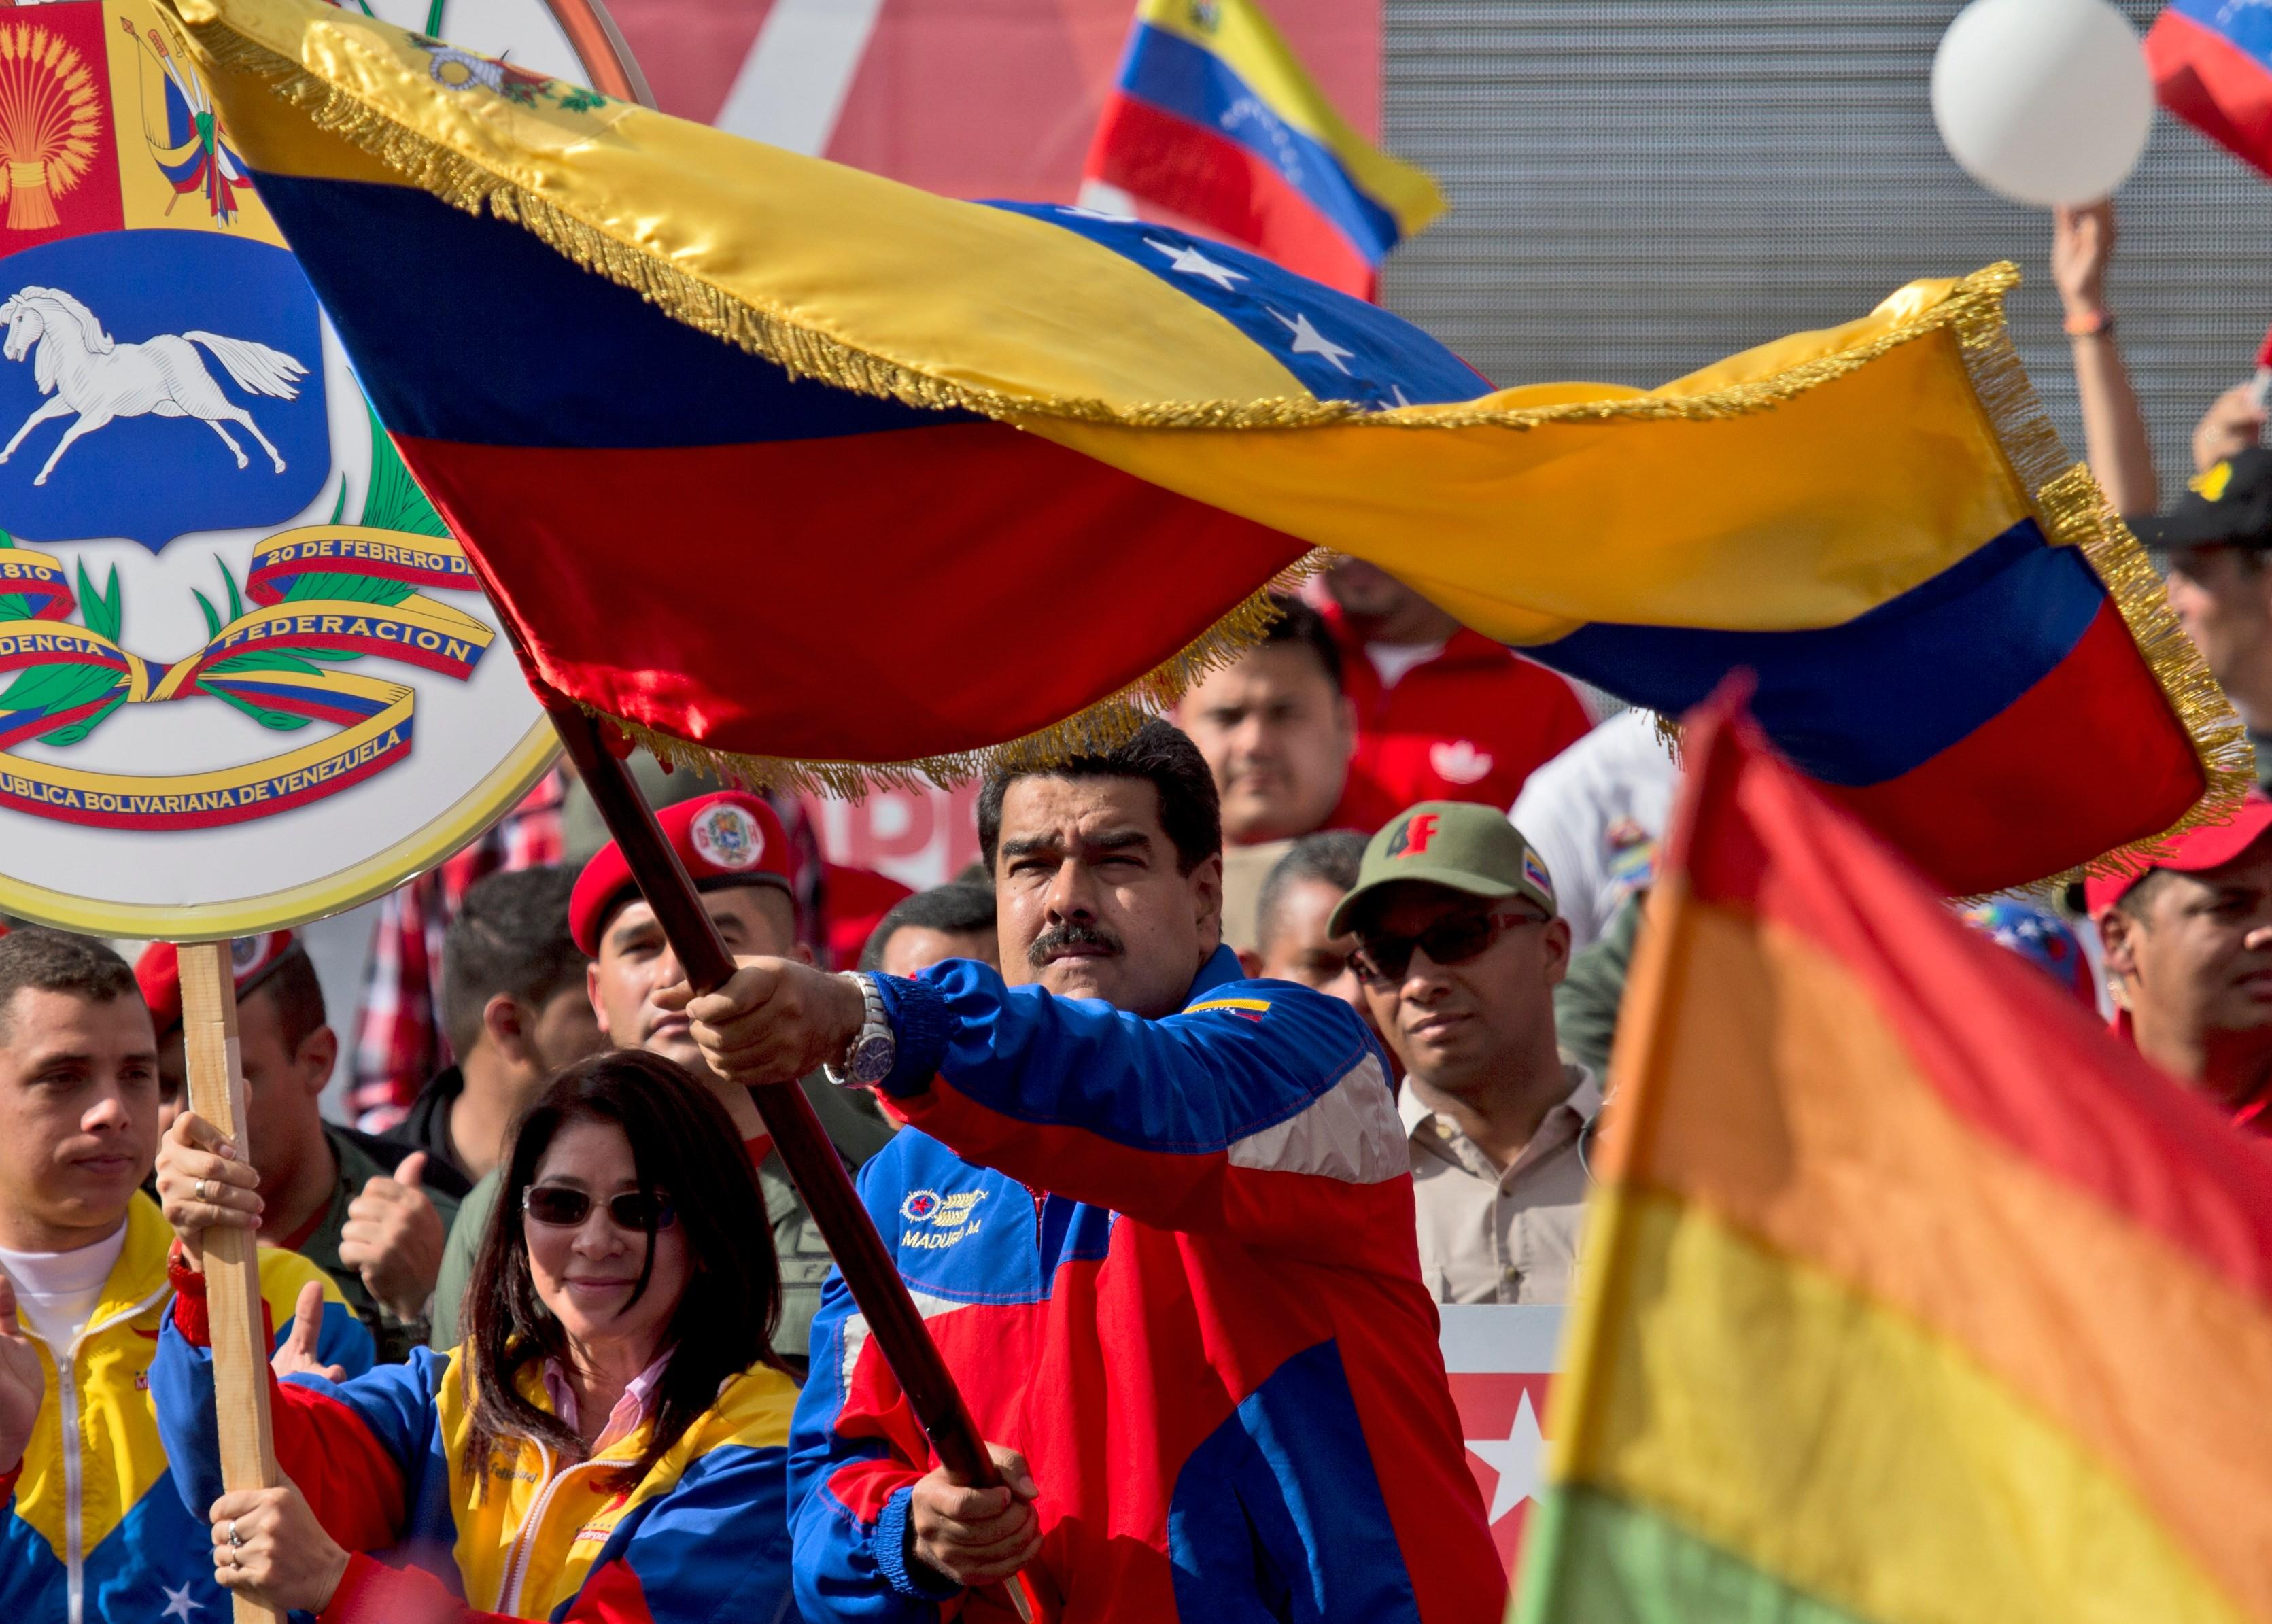 Venezuela to shrink U.S. Embassy staff, require tourist visas